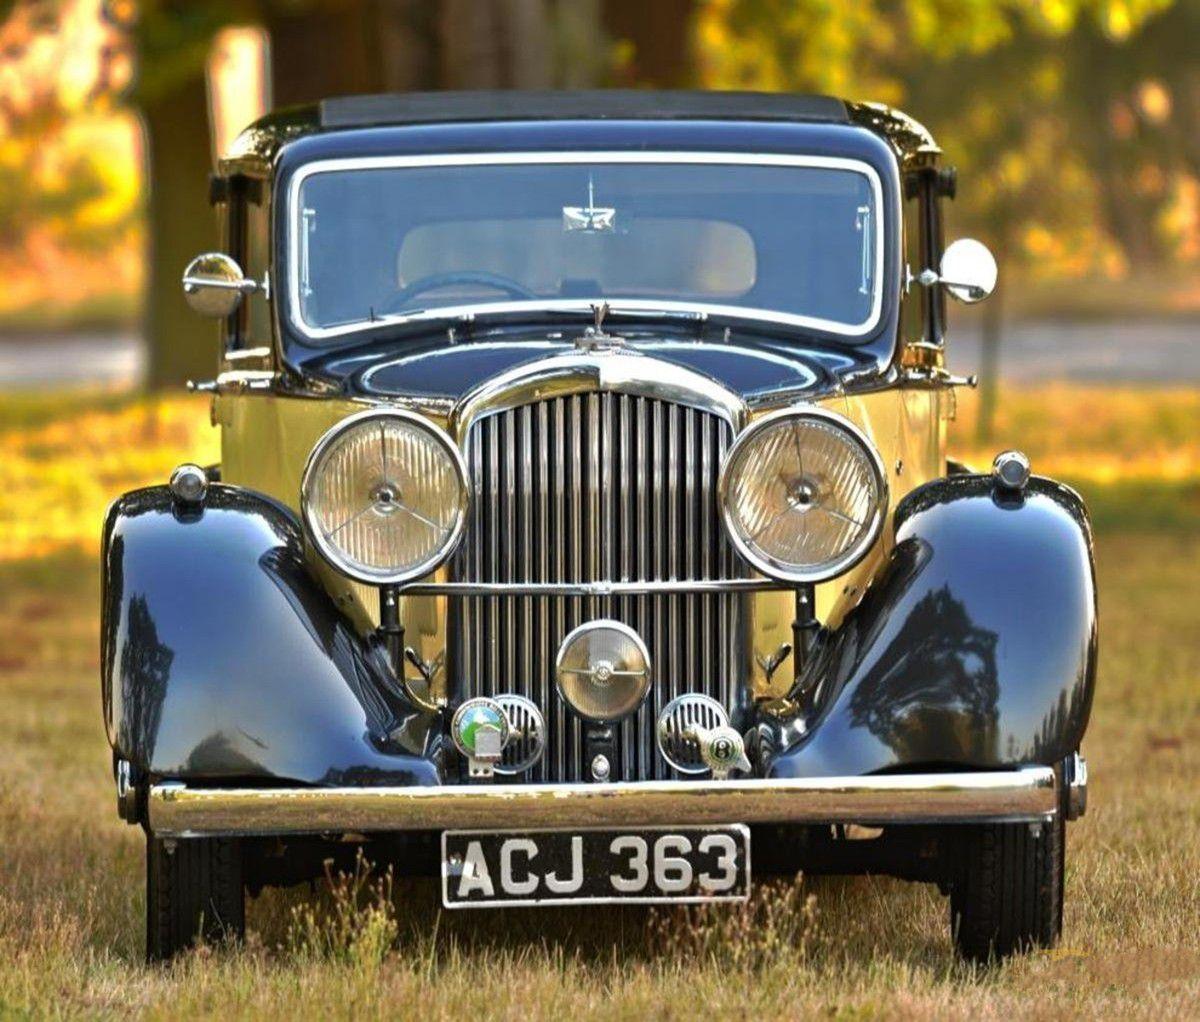 VOITURES DE LEGENDE (941) : BENTLEY DERBY 4 ¼  LITRE PARK WARD SPORTS SALOON - 1937